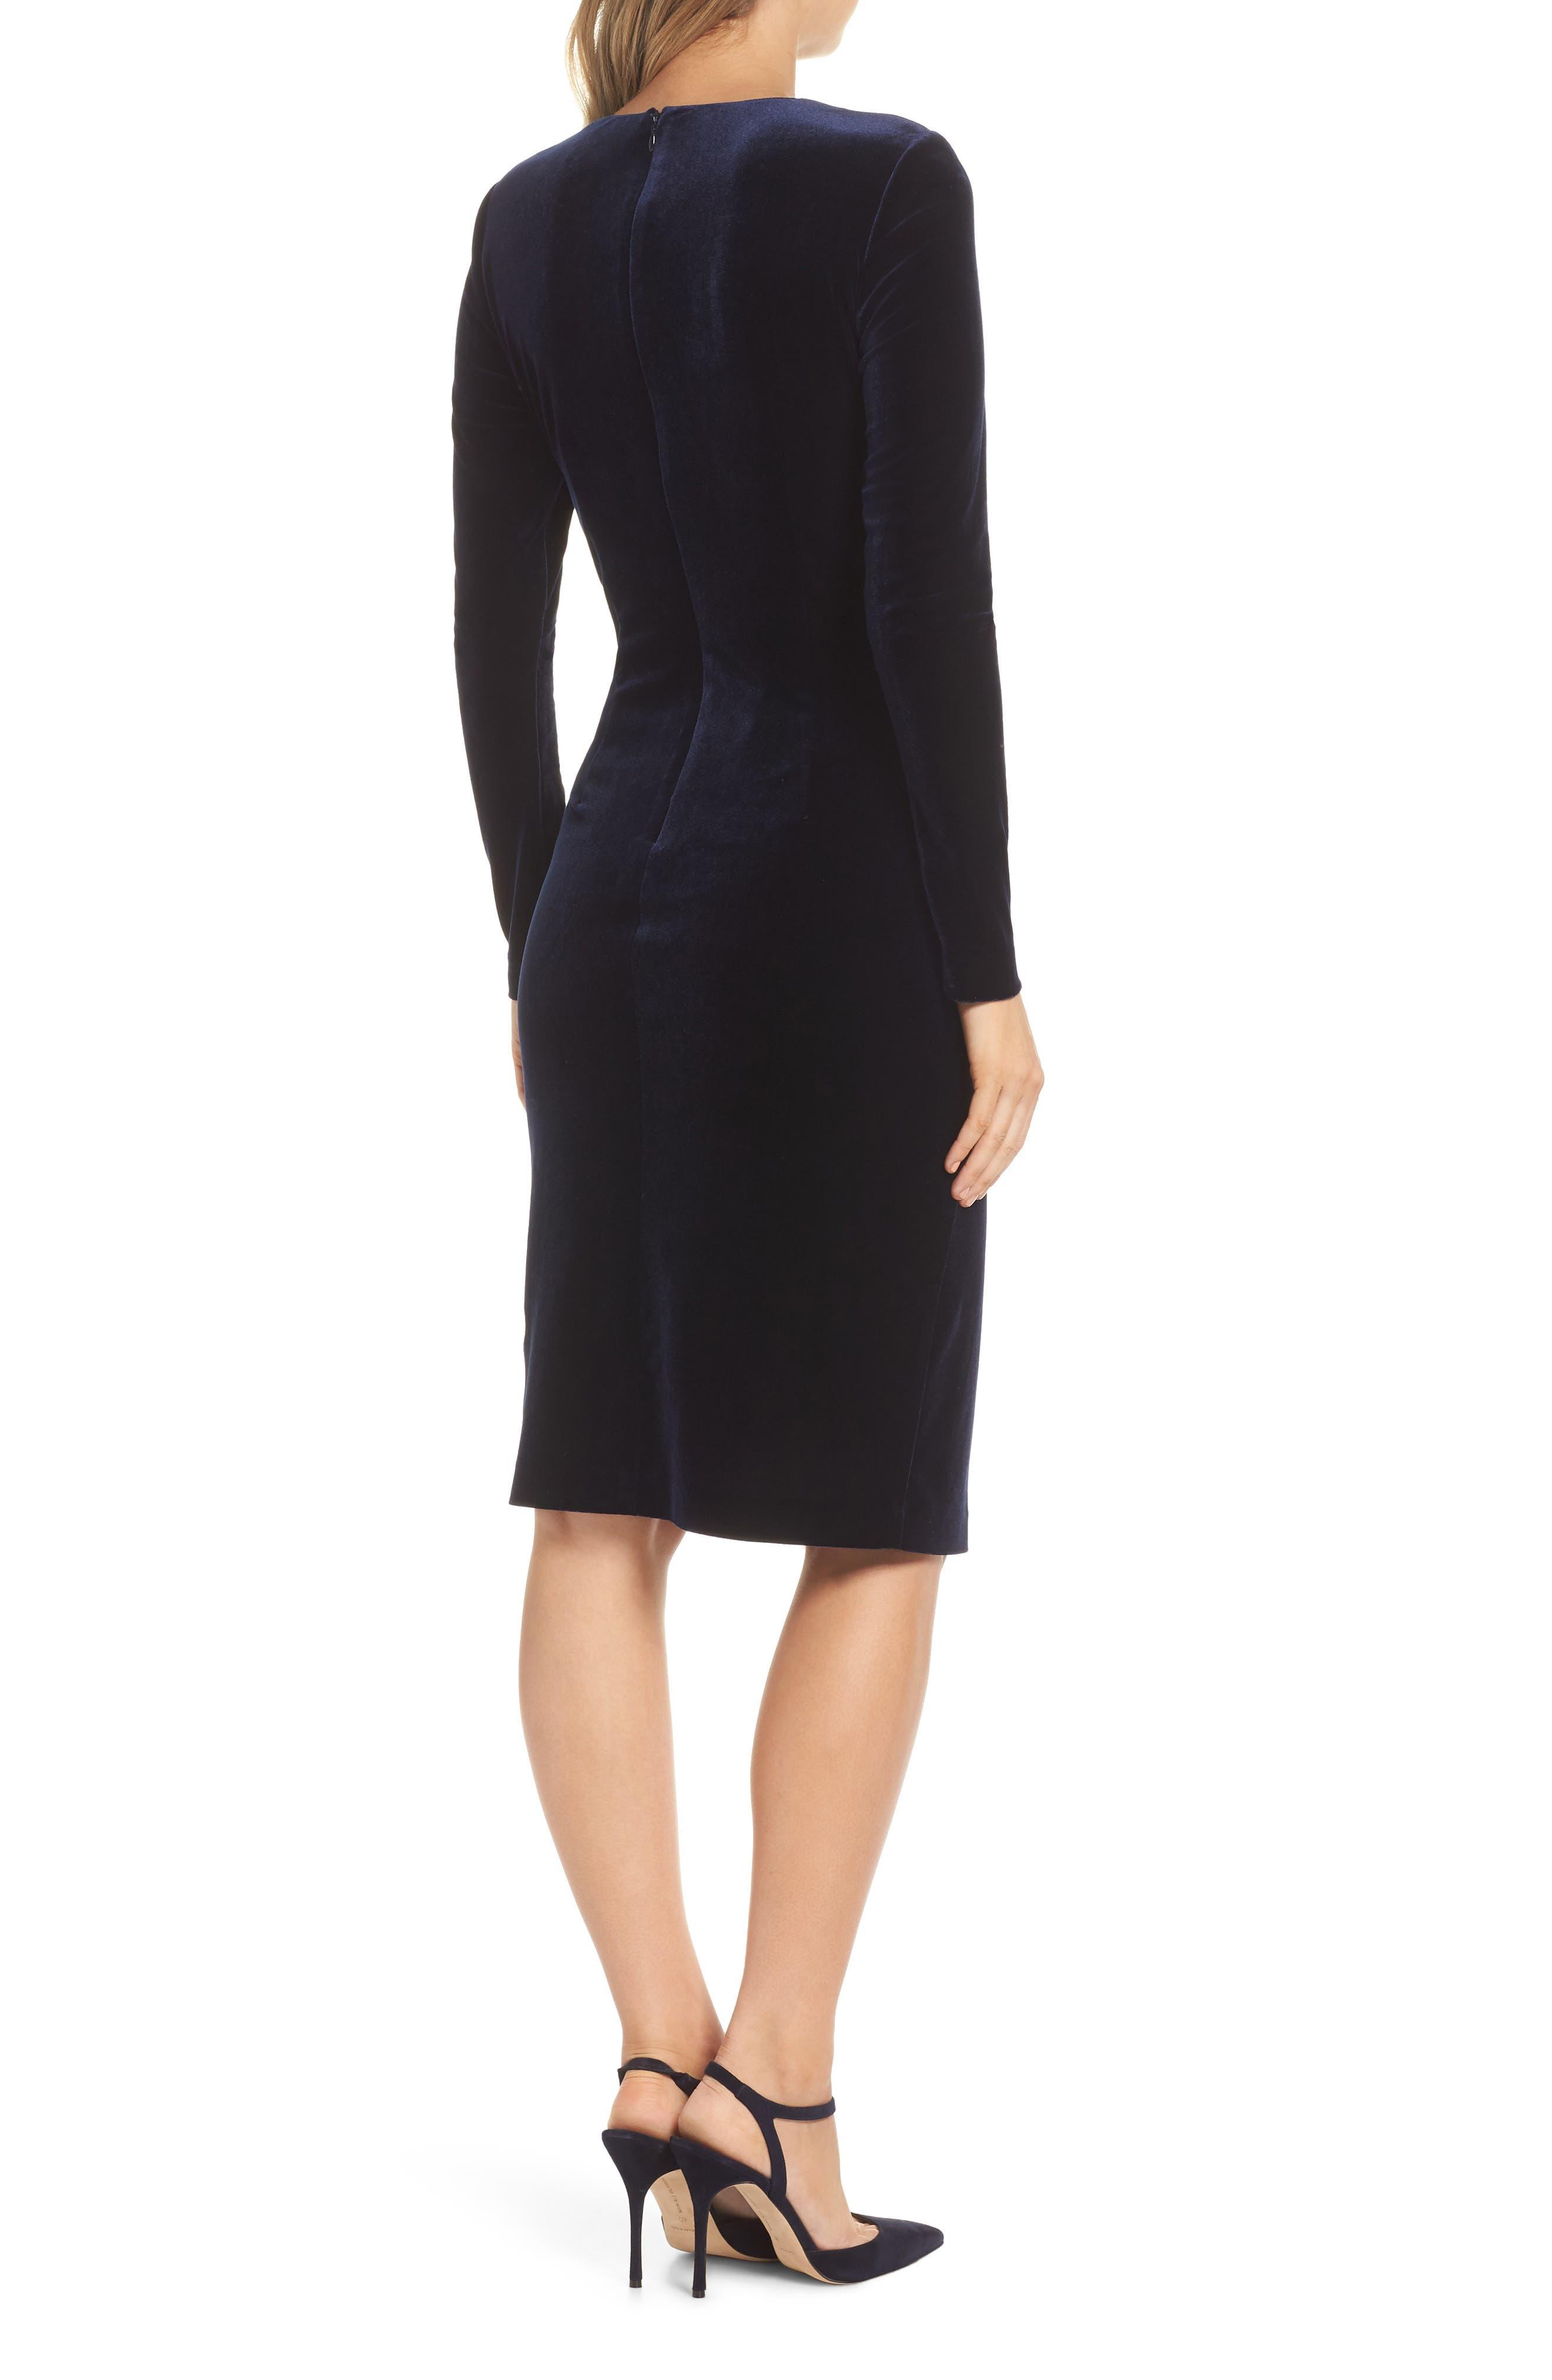 HARPER ROSE, Long Sleeve Body-Con Dress, Alternate thumbnail 2, color, 410